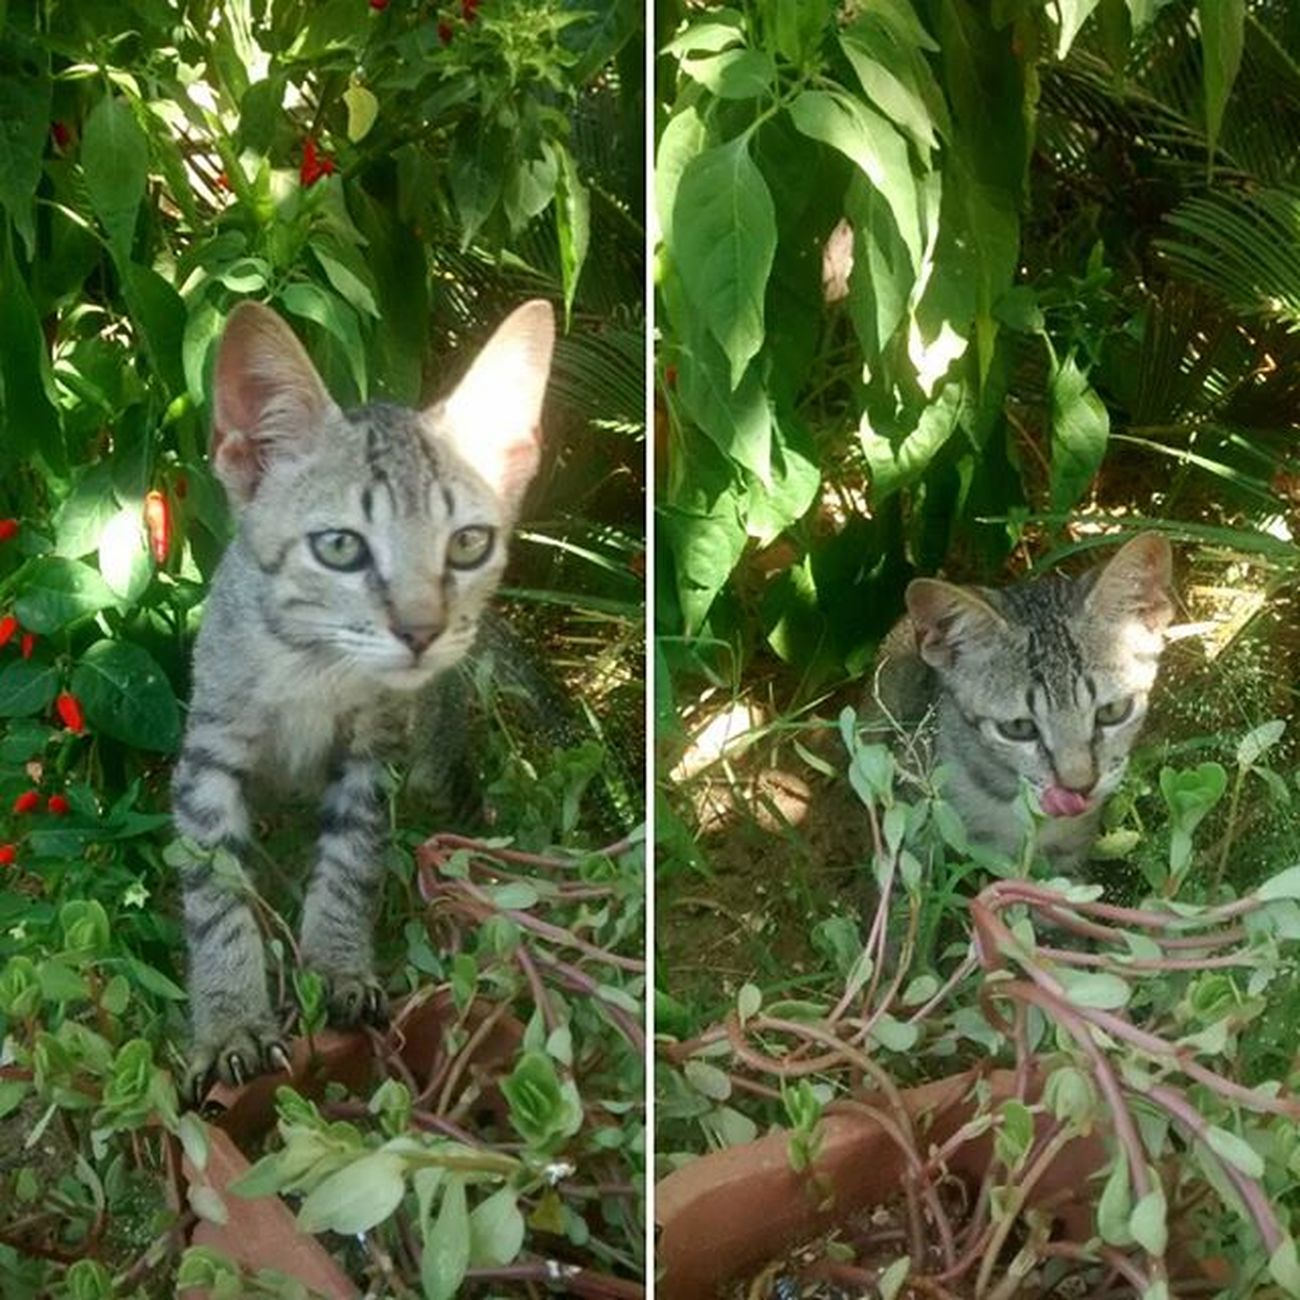 Oi, eu sou o gatão. O rei do jardim. Cat Gatto Gato Gatao Animal Animale Kingofthegarden Buzios Buziosrj Errejota  Riodejaneiro Rio40graus Semfiltro Brazil Brasil